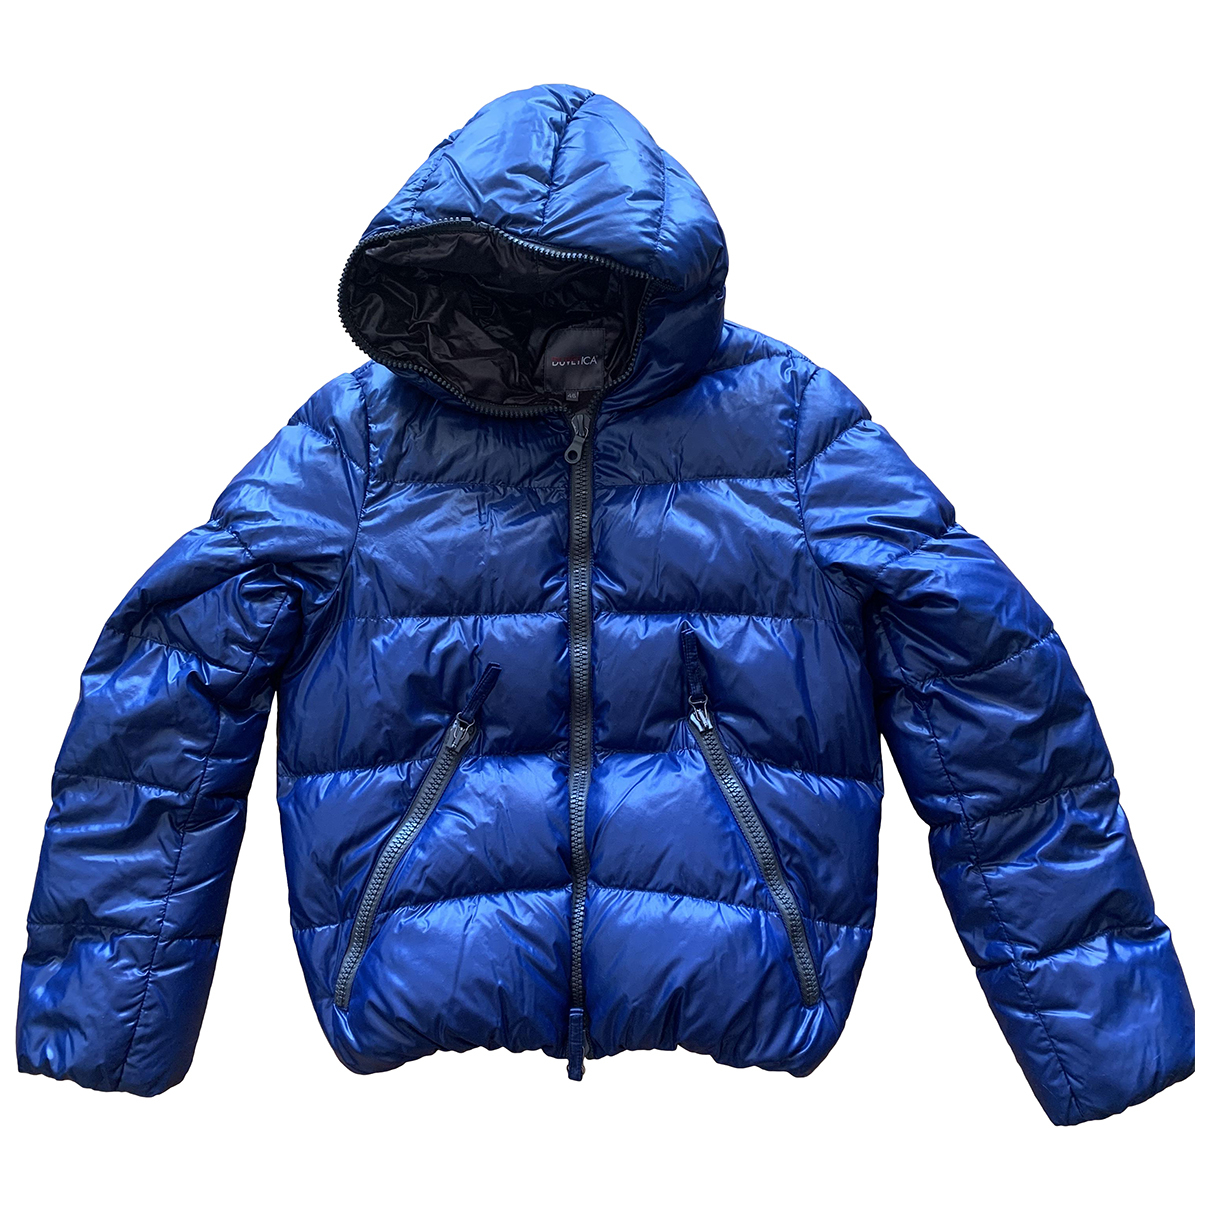 Duvetica N Blue coat  for Men 46 IT